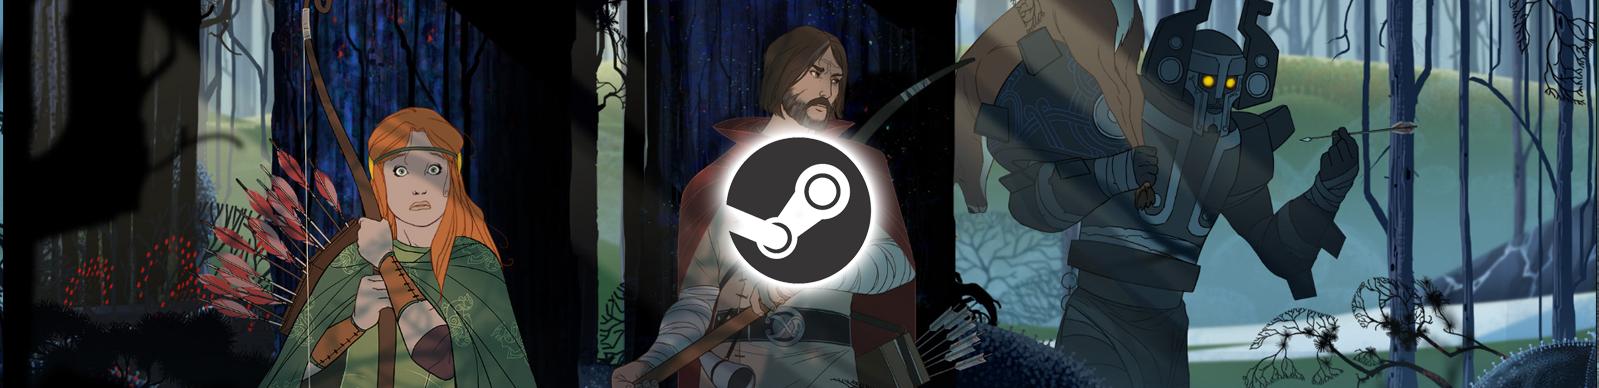 The Banner Saga 50% off on Steam